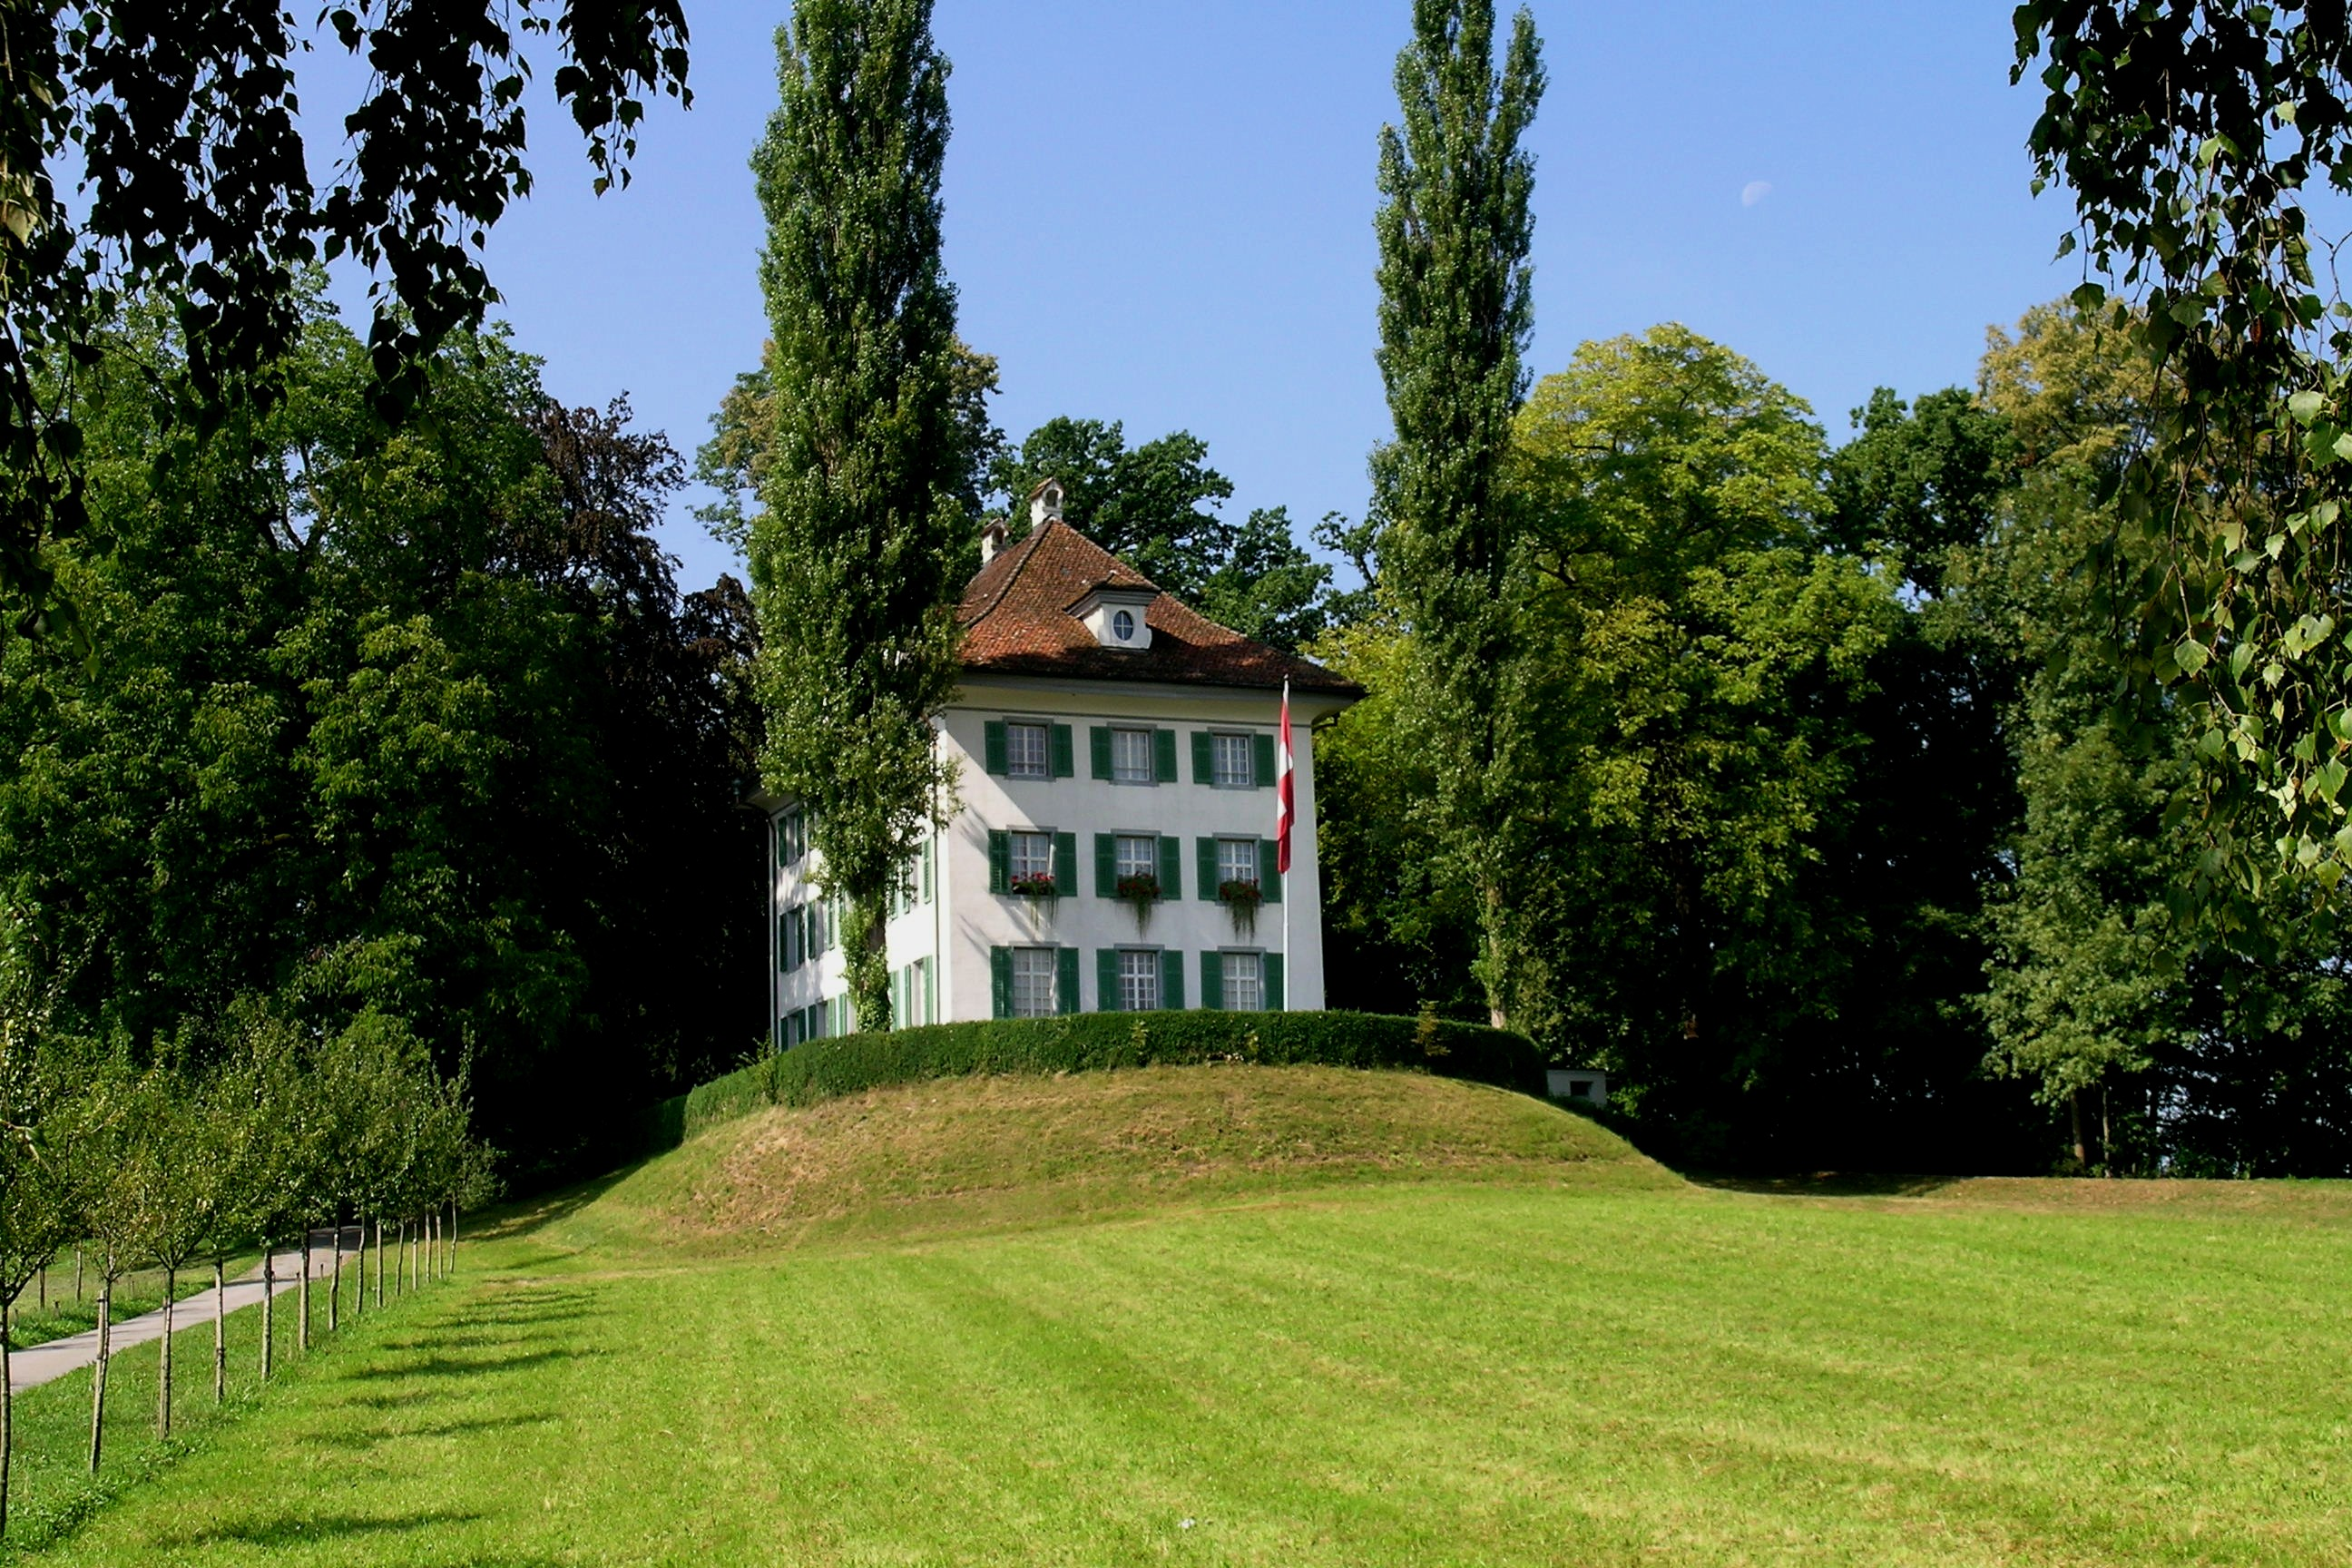 La Villa Tribschen de Lucerna, convertida en Museo Richard Wagner.